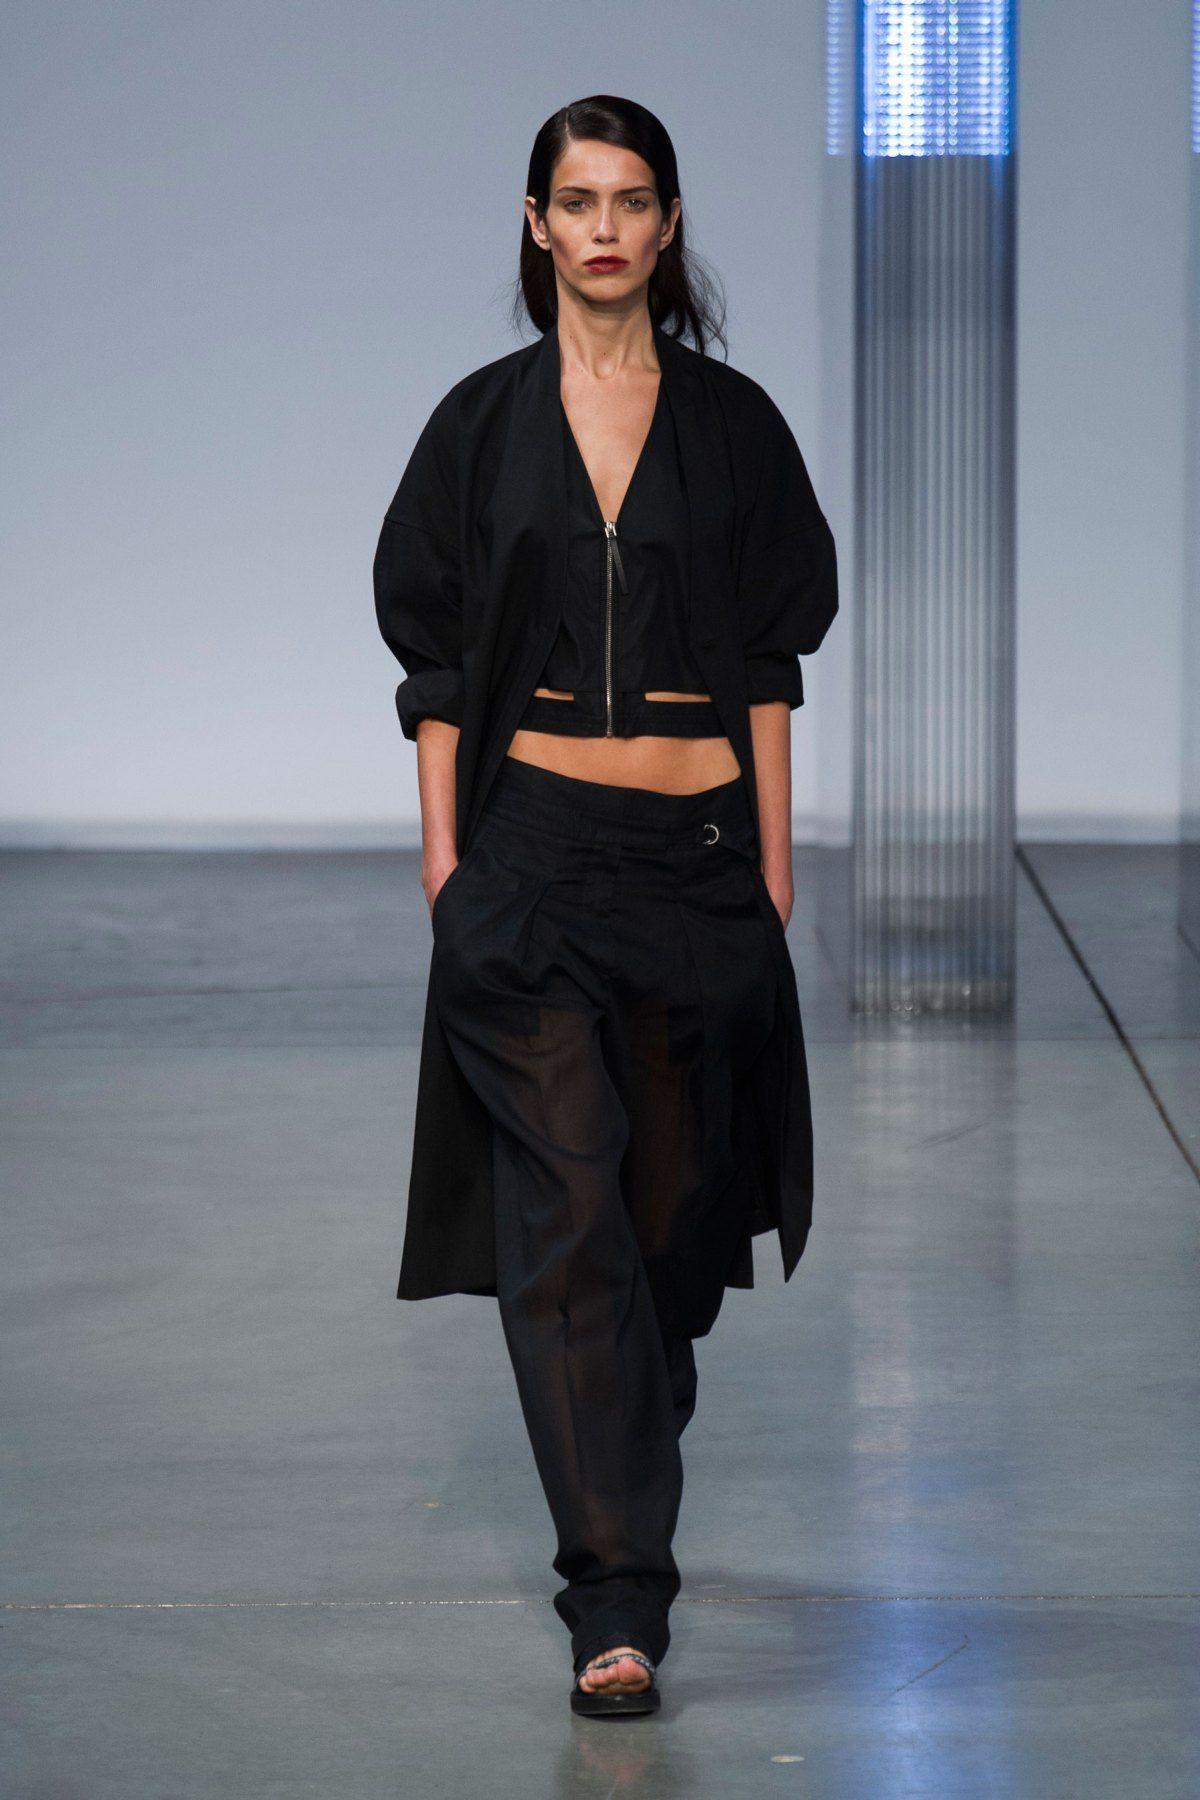 Helmut Lang | Nova York | Verão 2014 RTW